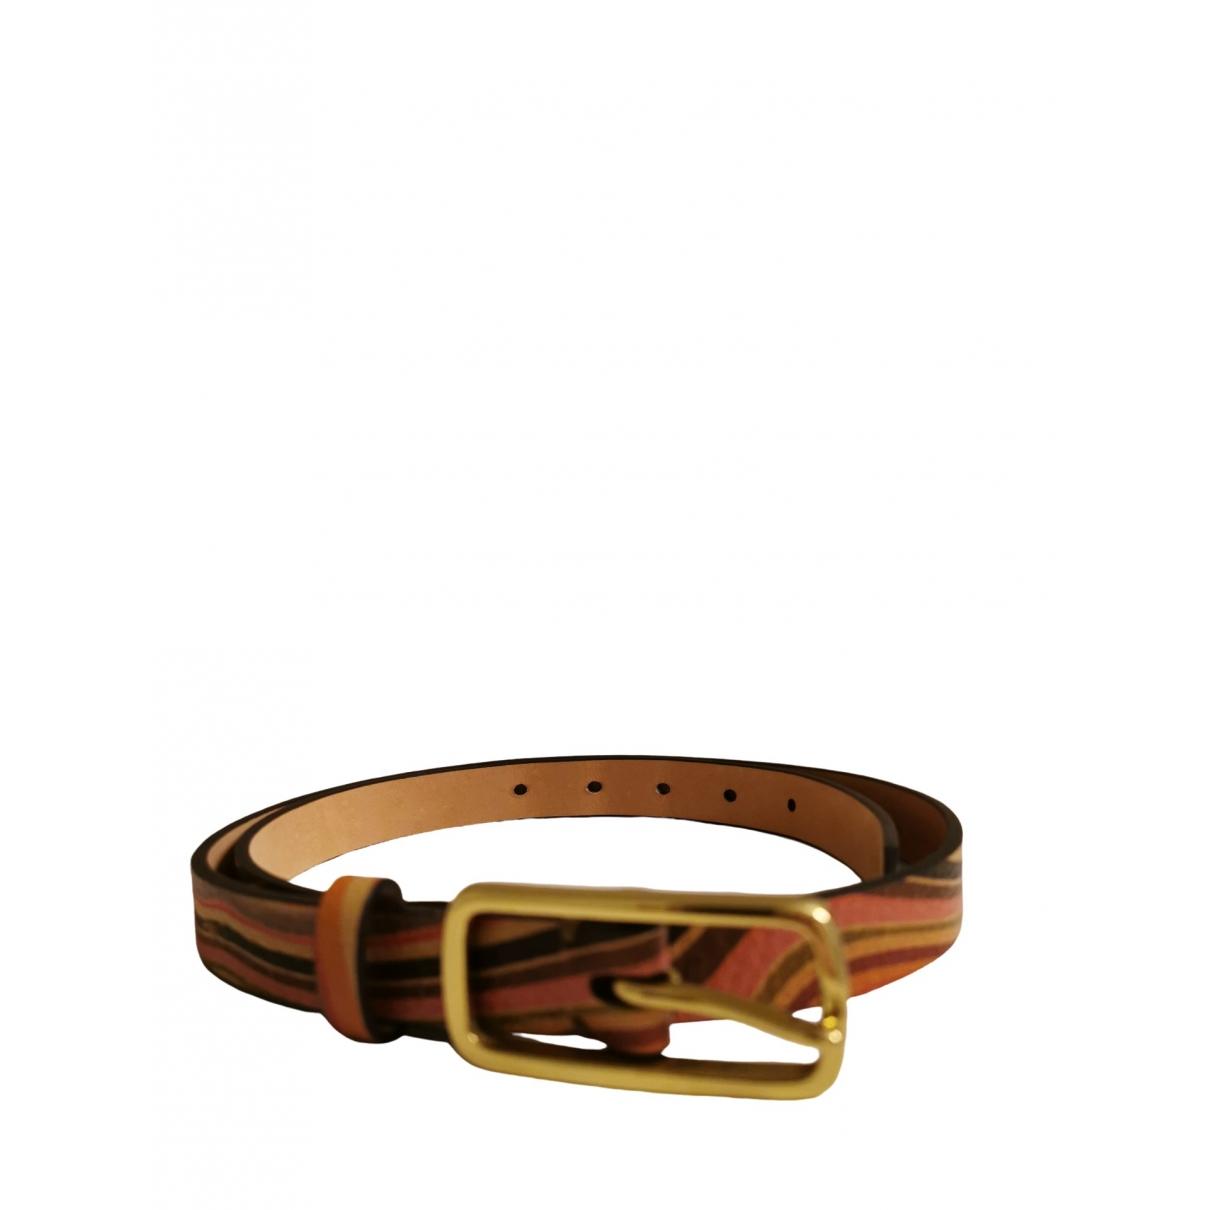 Paul Smith \N Leather belt for Women M International